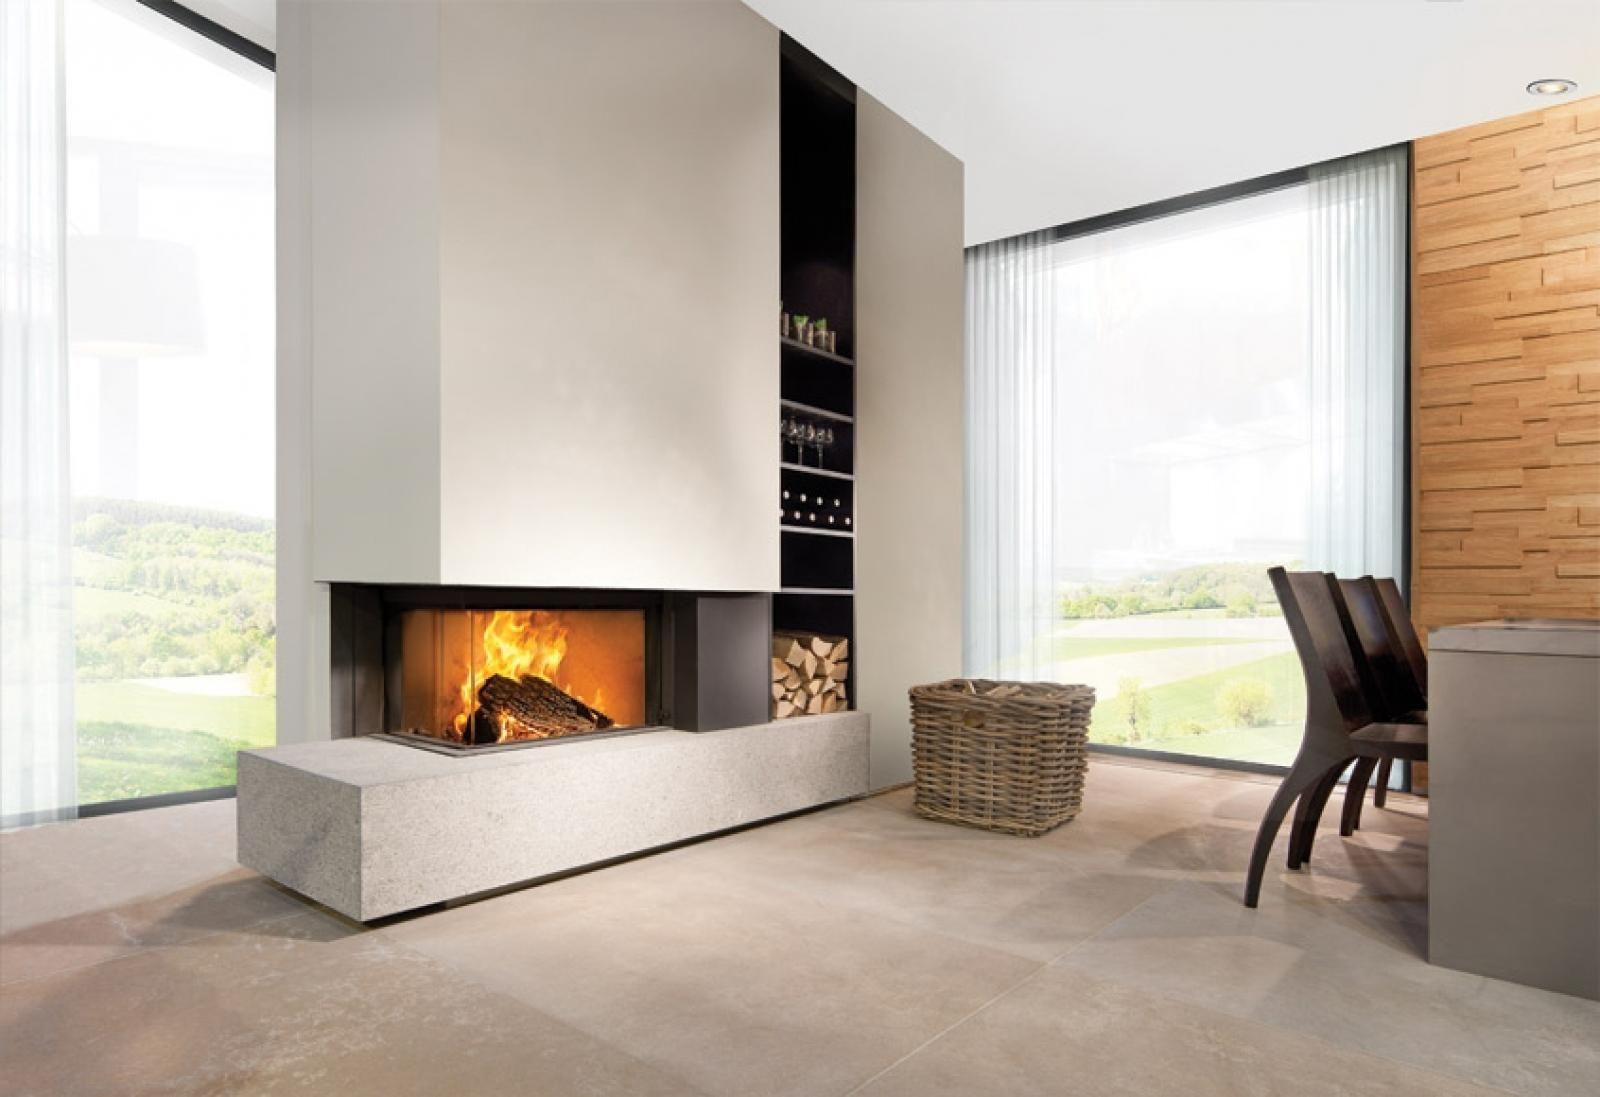 foyer a bois heat pure 65 de coin chemin e chemin e moderne foyer et feu ouvert. Black Bedroom Furniture Sets. Home Design Ideas